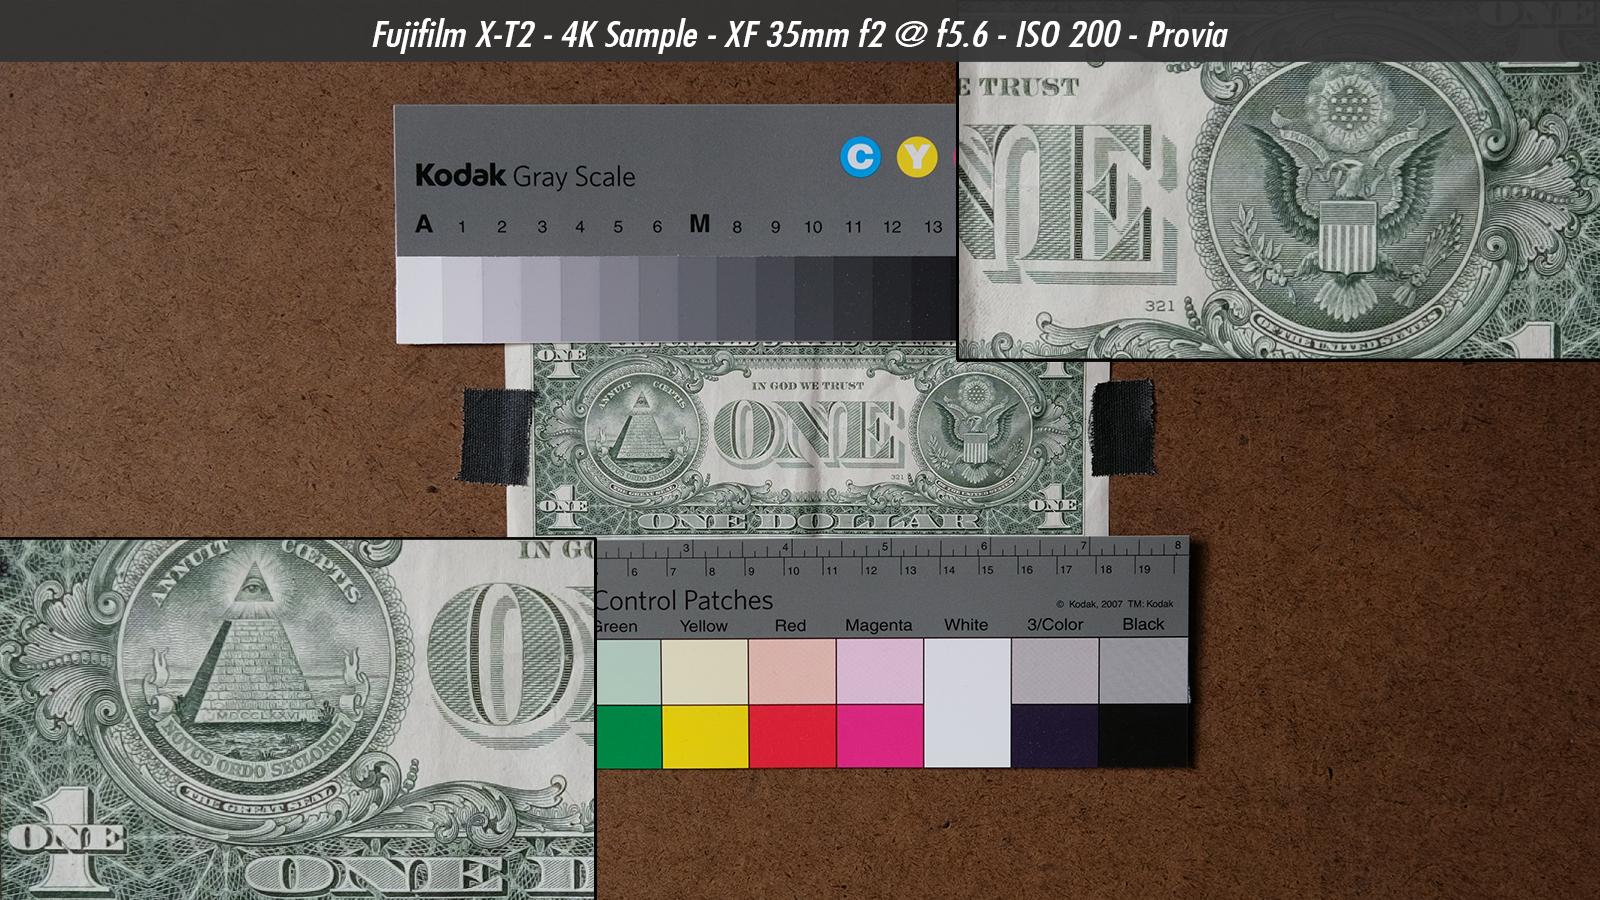 Fujifilm X-T2 4K Video Resolution Sample